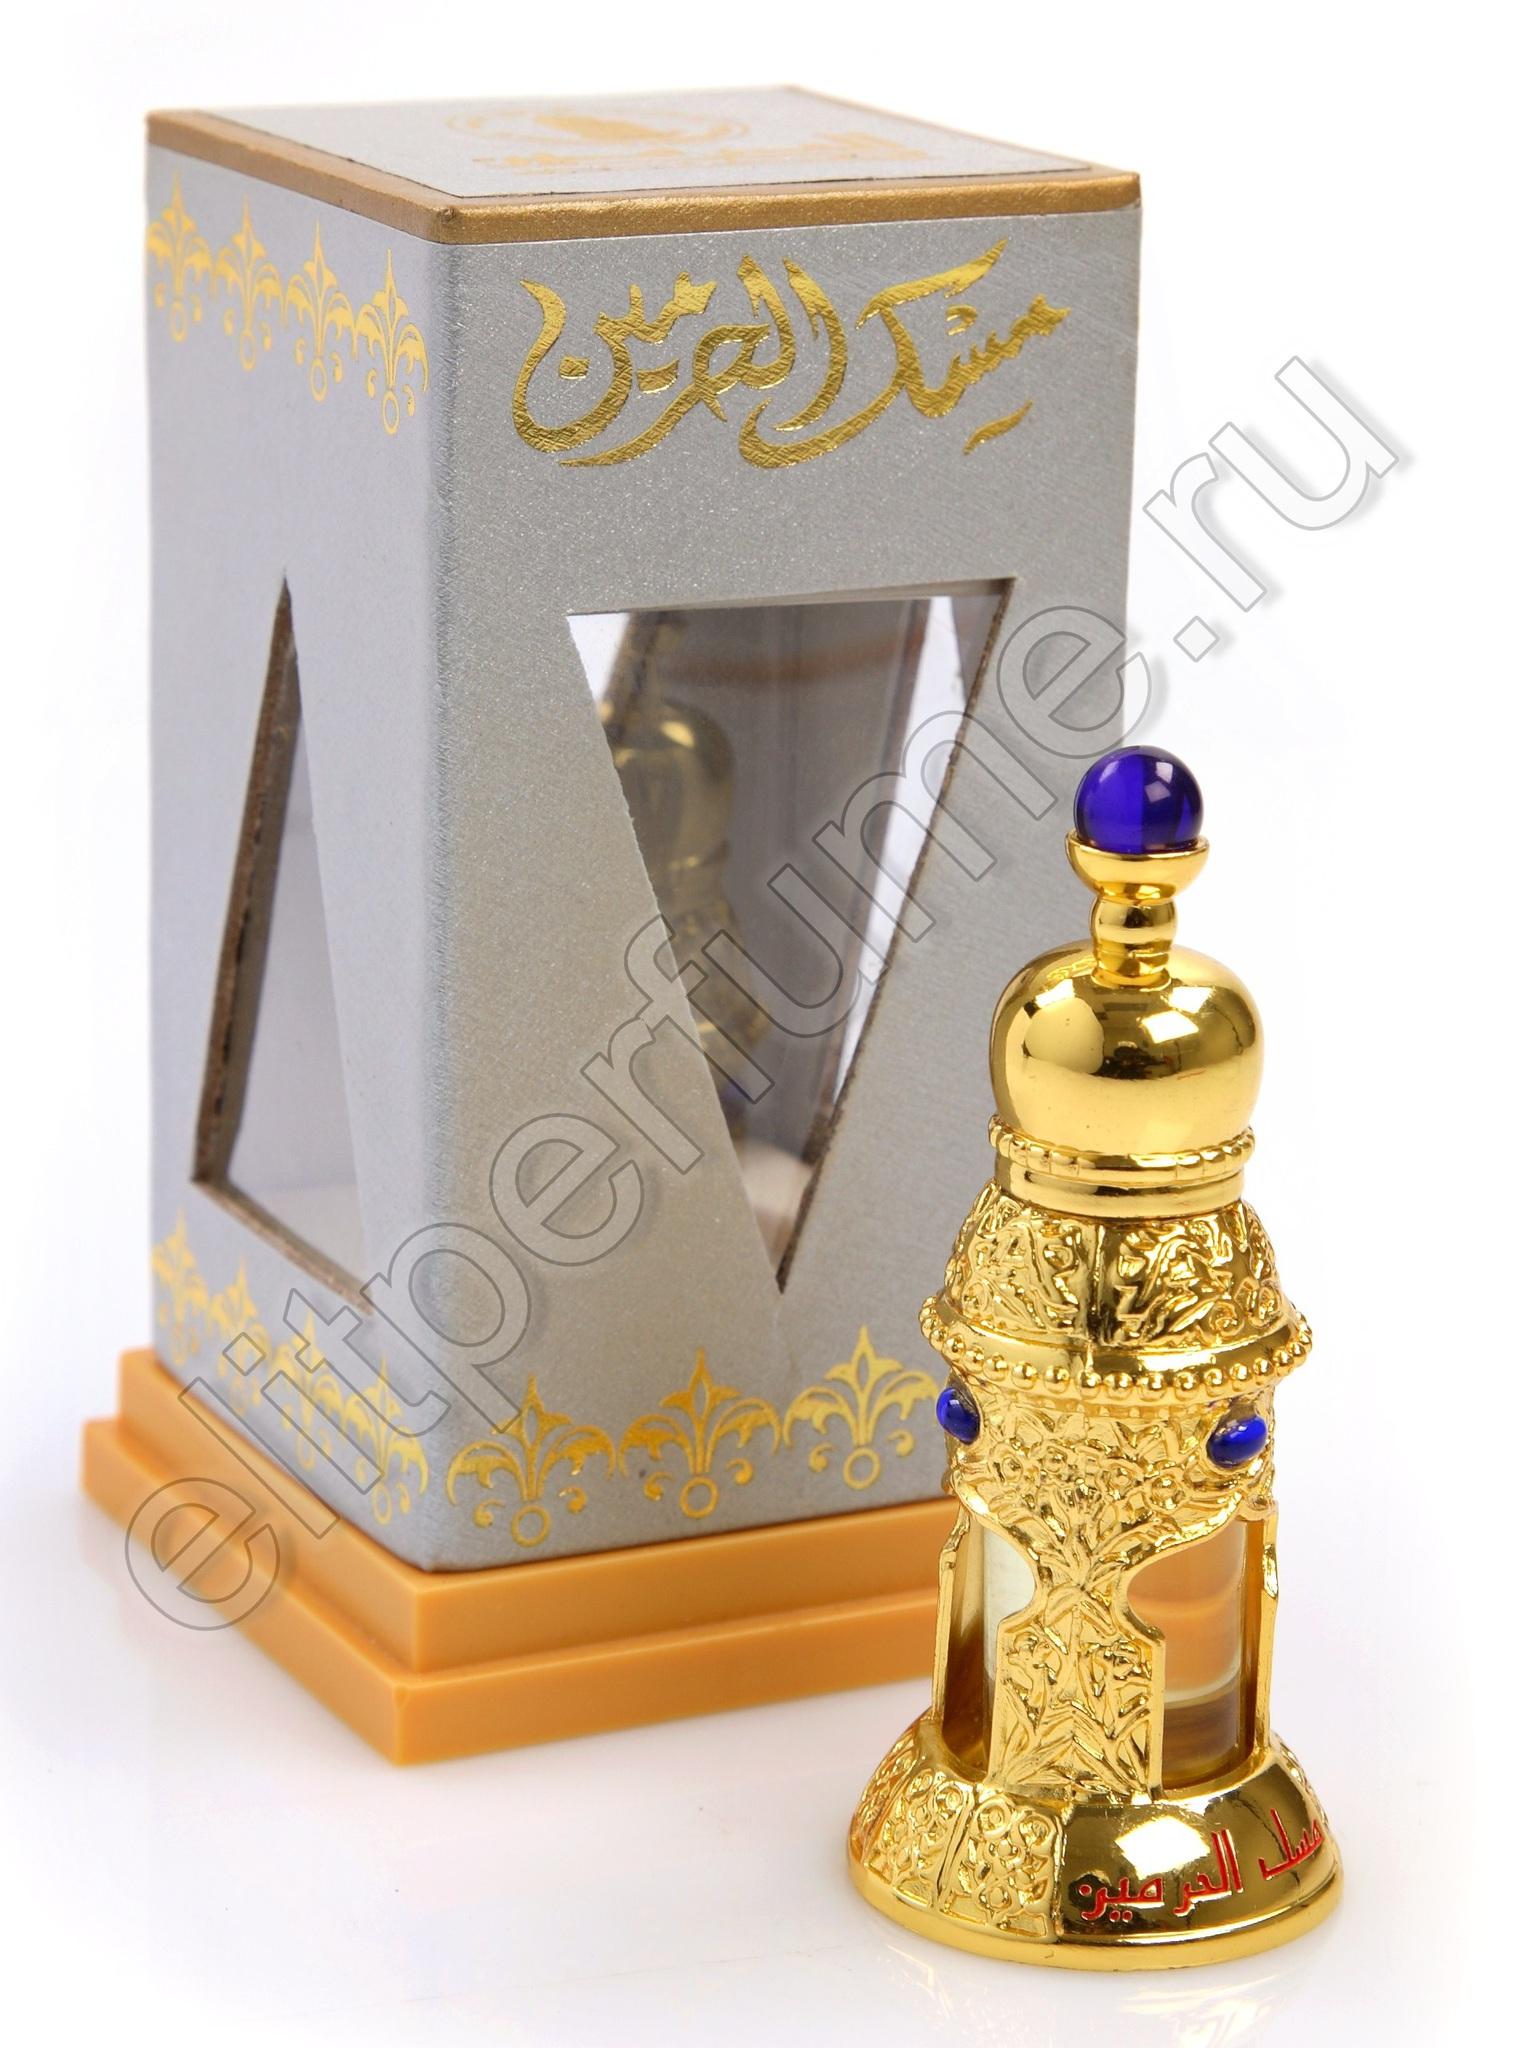 Мускус Аль Харамайн Musk Al Haramain 12 мл арабские масляные духи от Аль Харамайн Al Haramain Perfumes